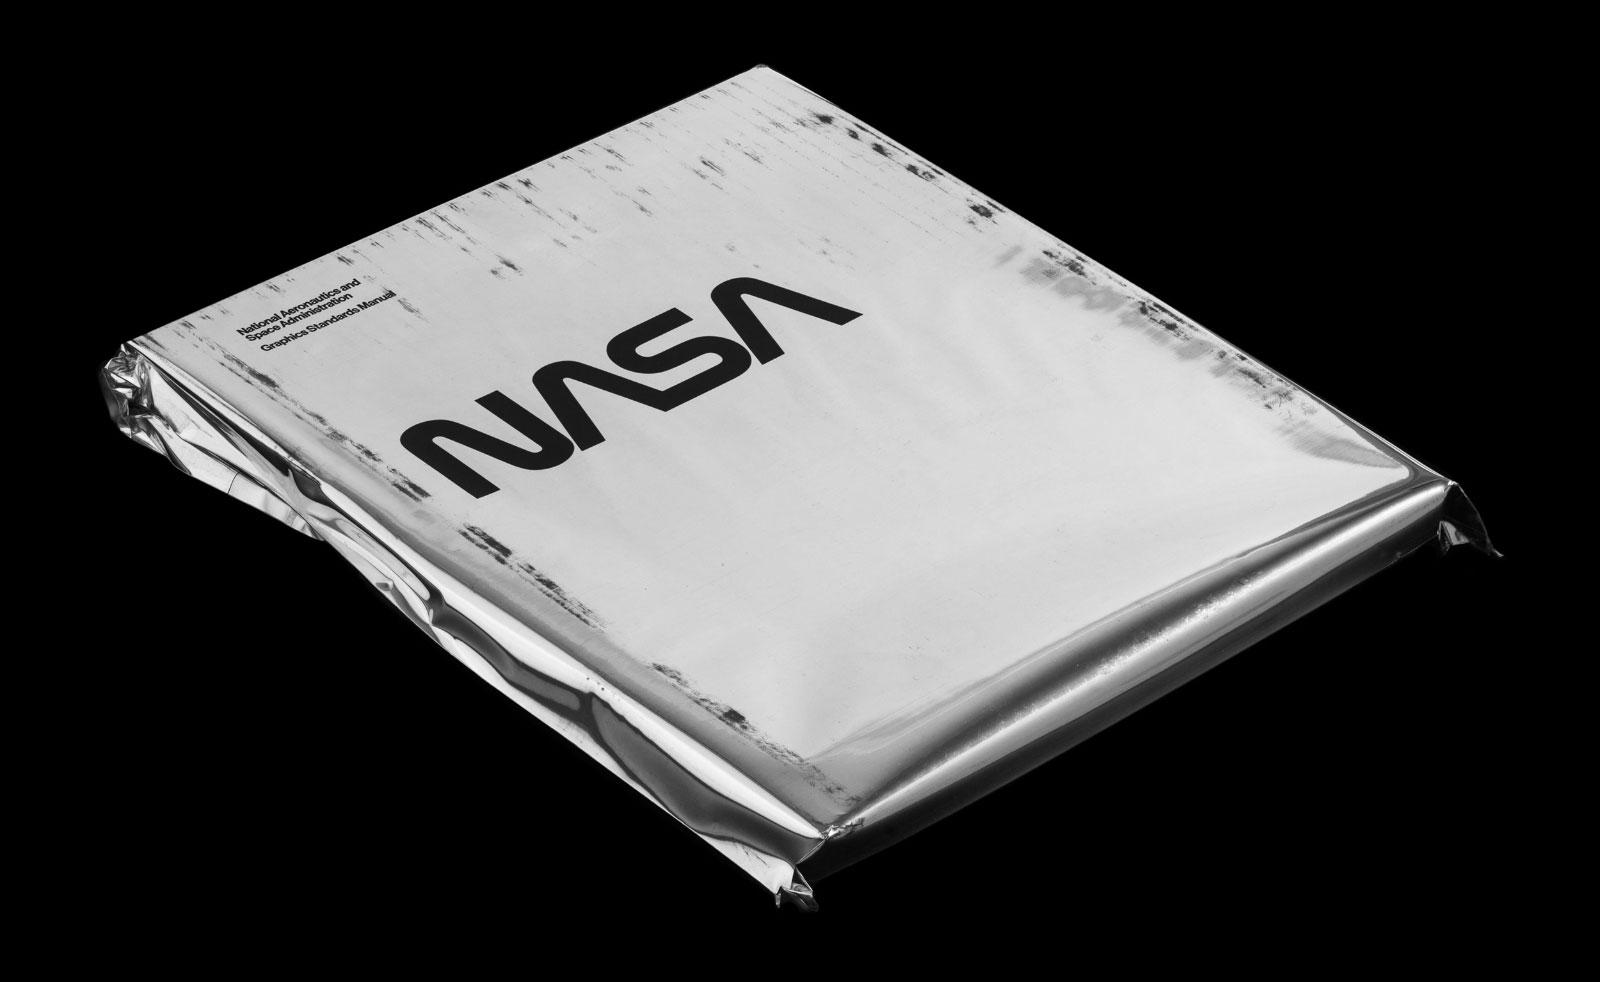 001_NASA-1600.jpg  22 Brand Style Guide Examples for Visual Inspiration 001 NASA 1600